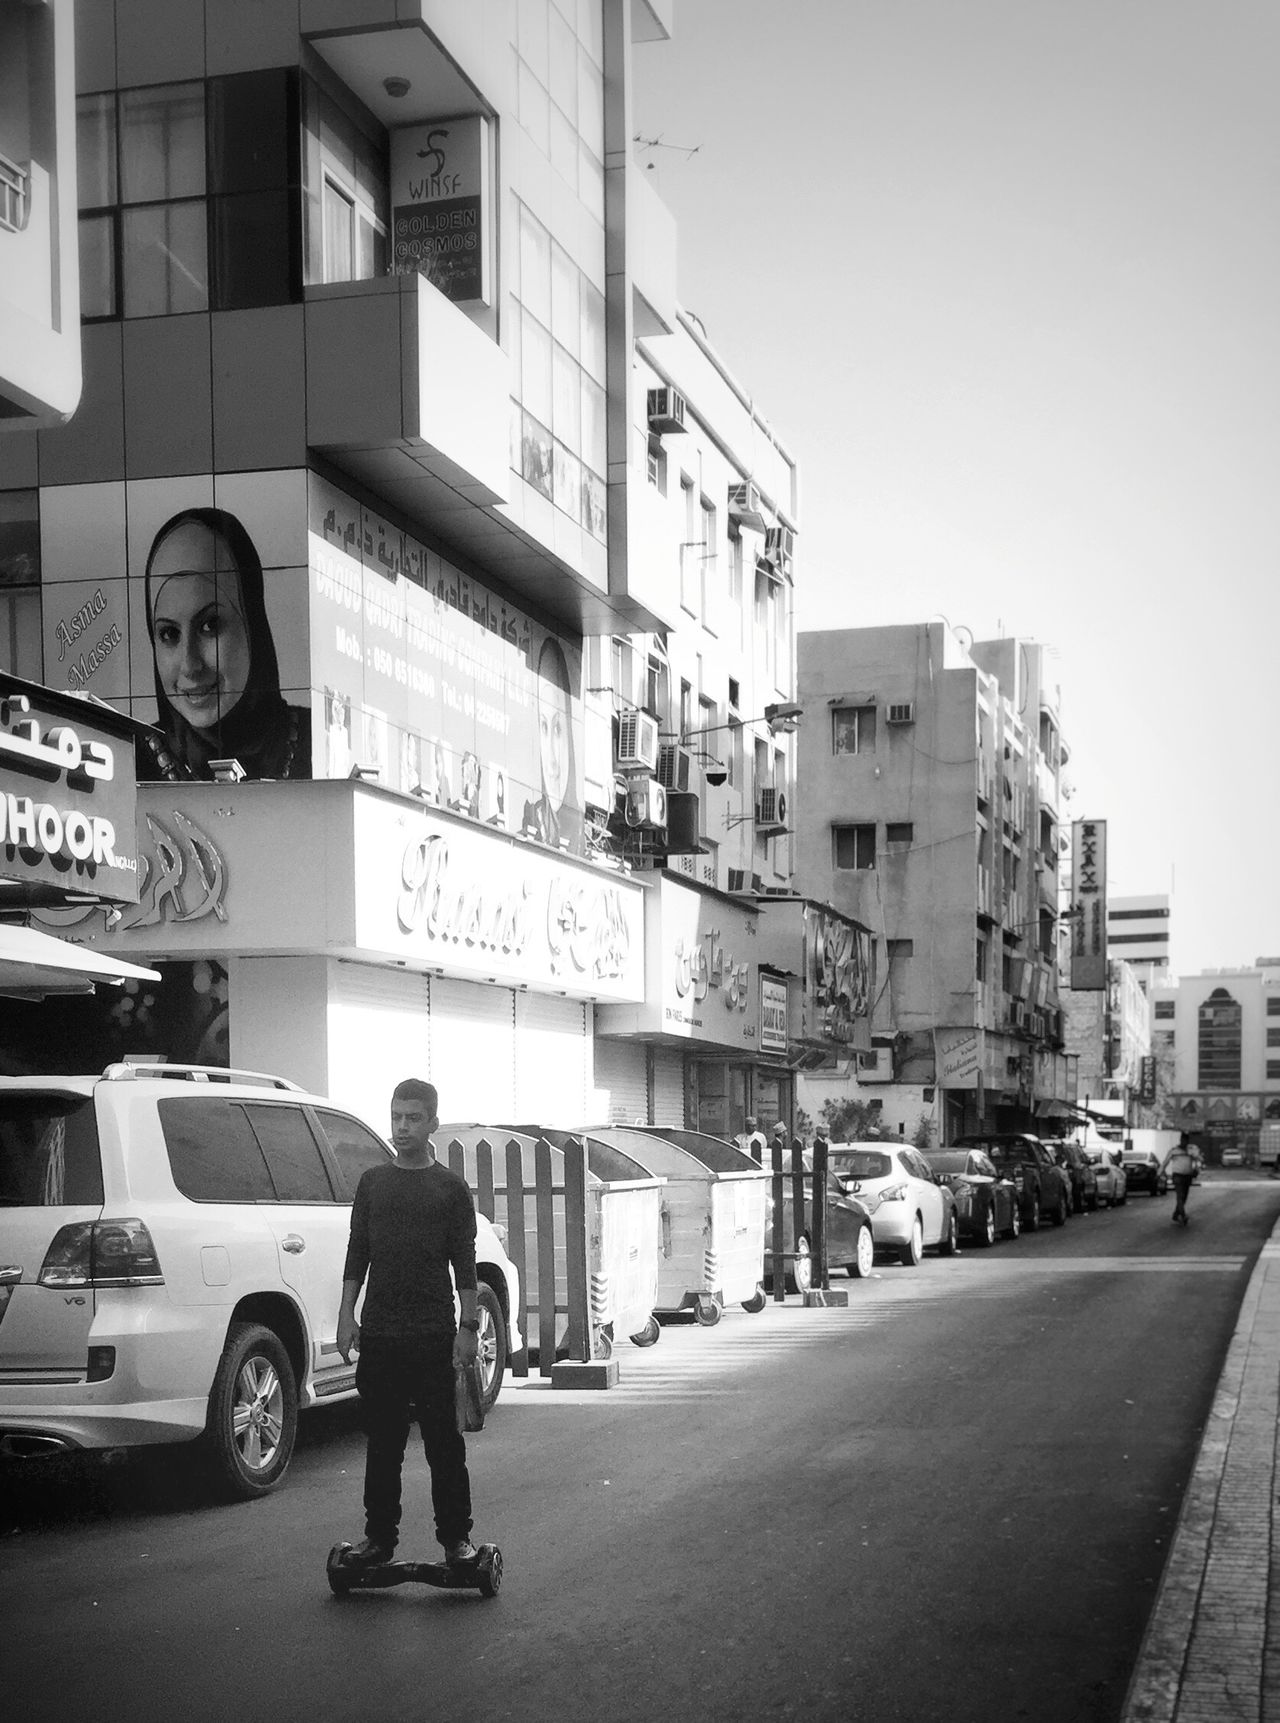 Monochrome Photography Street Scene